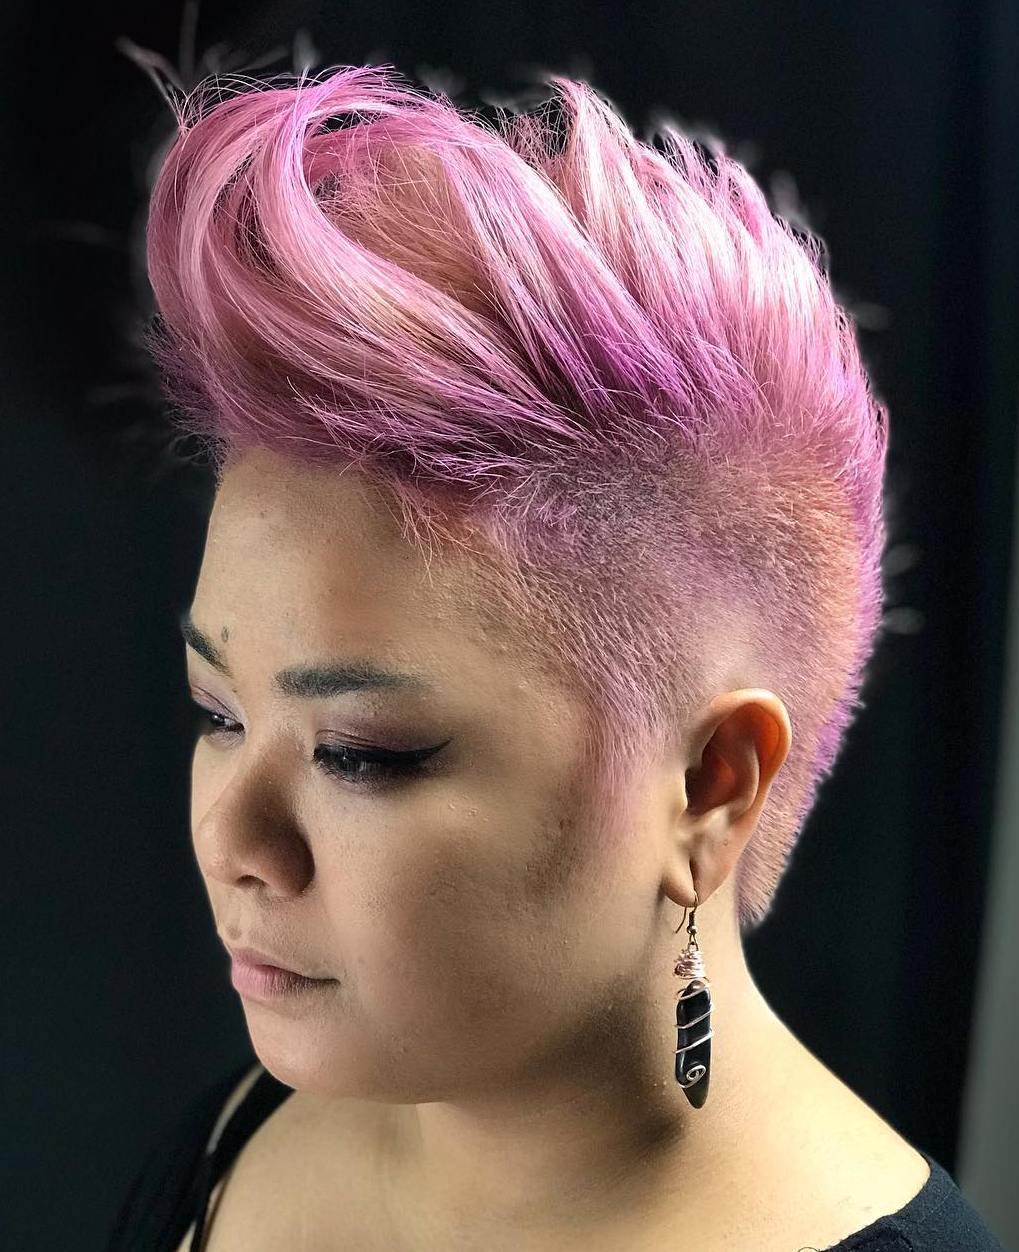 Pale-Pink Mohawk